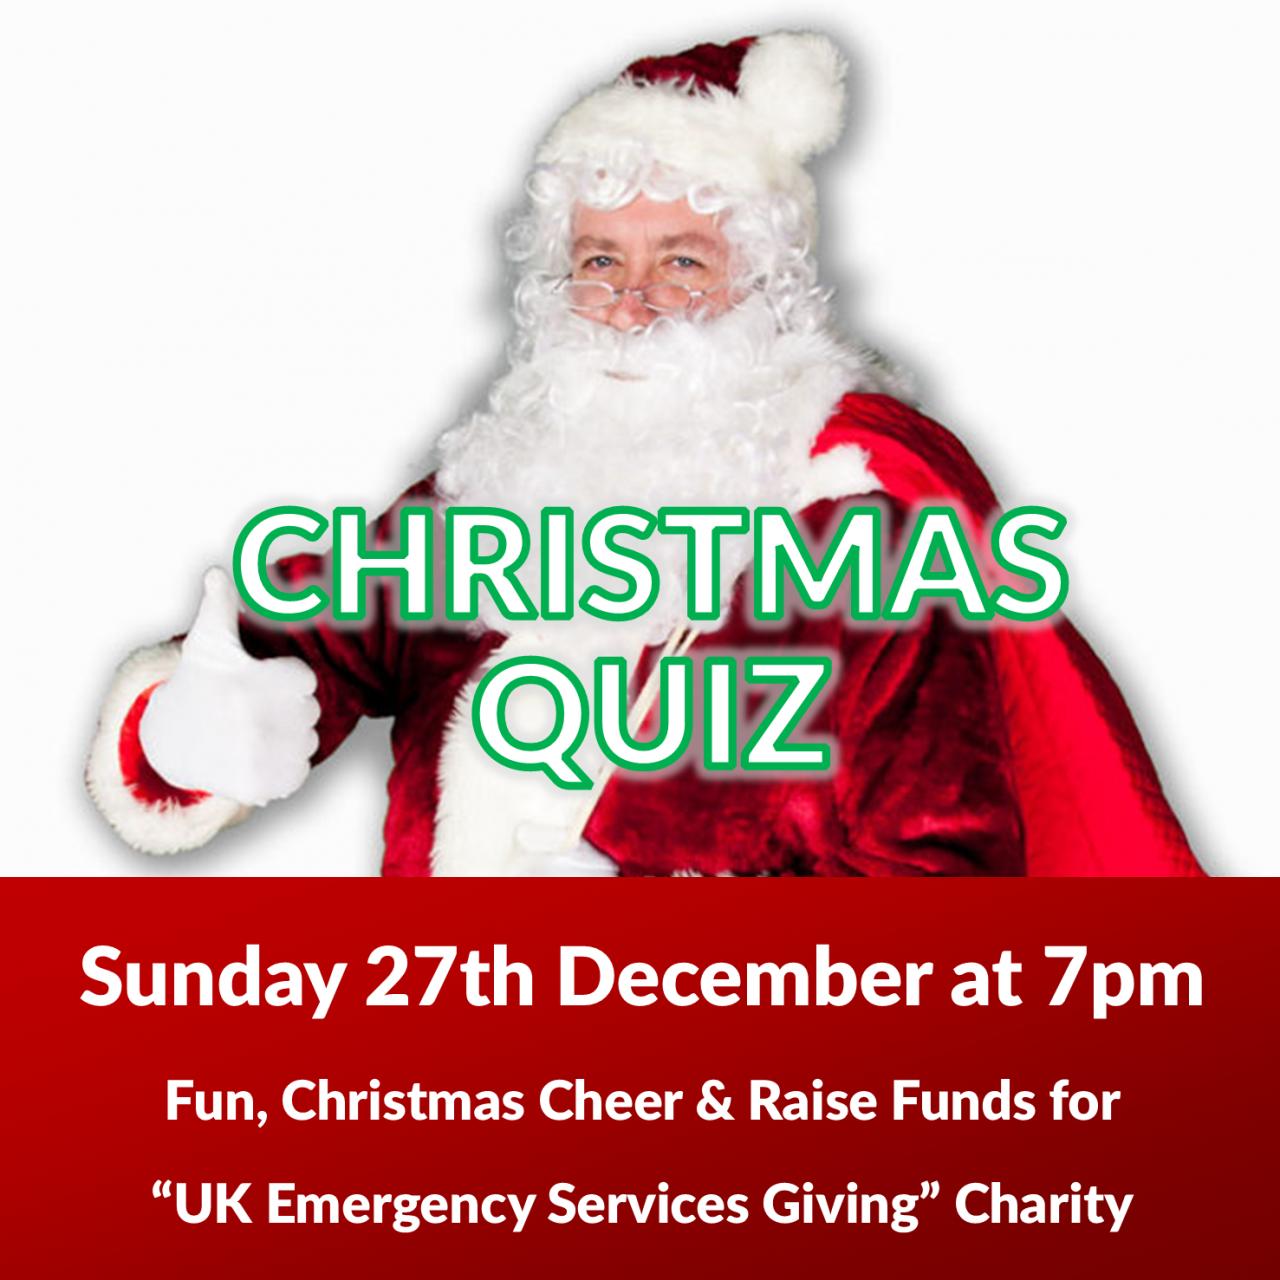 Christmas Charity Quiz raising funds for UK Emergency Responders